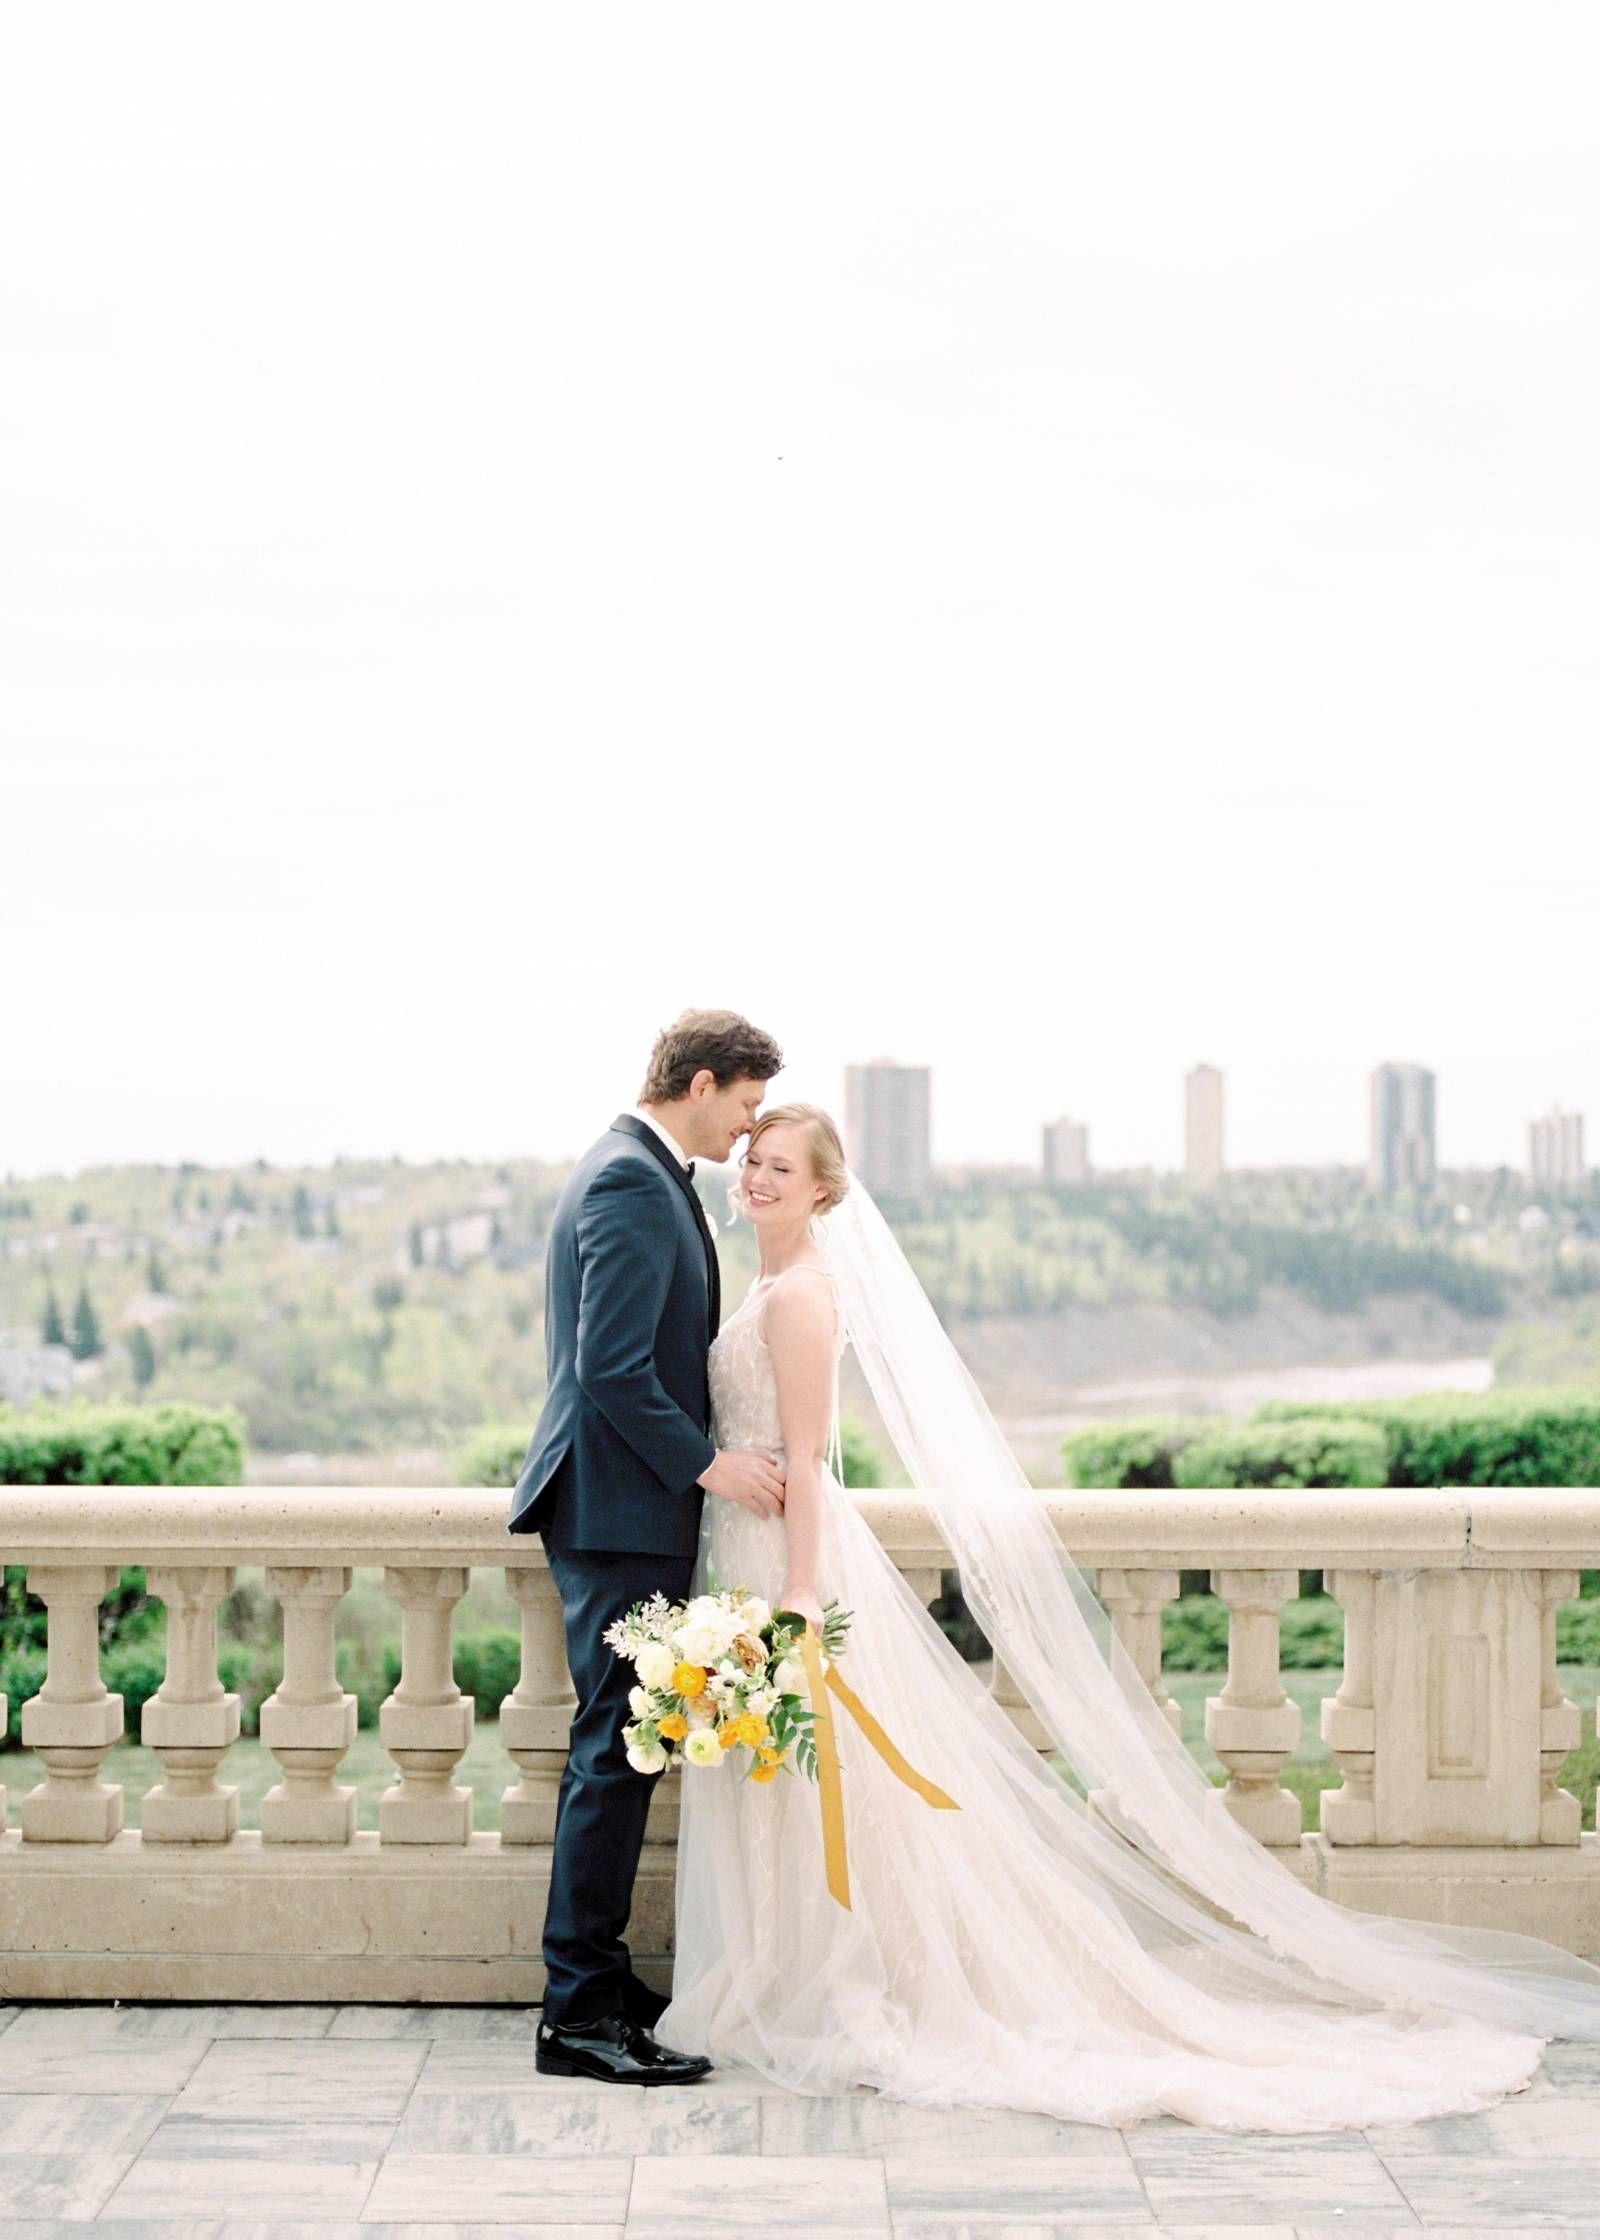 Edmonton Fairmont Hotel Macdonald Wedding Editorial Via Minted Photography In 2020 Edmonton Wedding Hotel Macdonald Fairmont Hotel